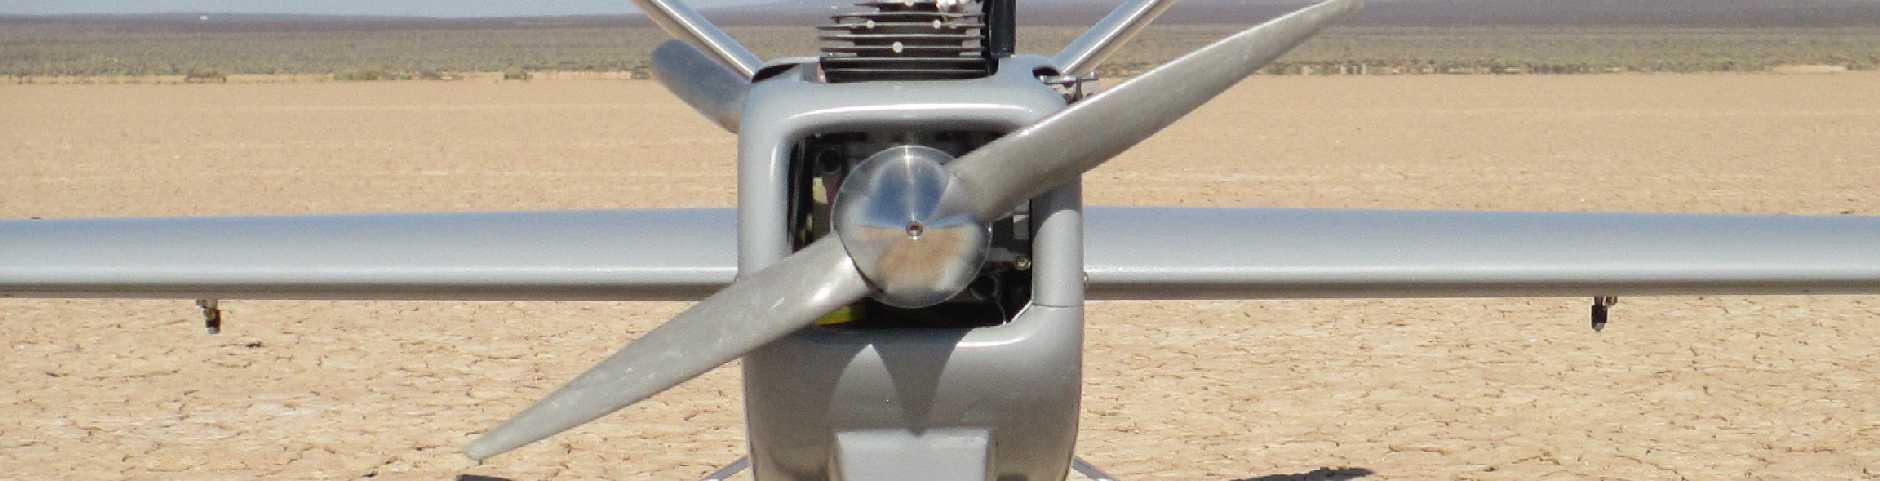 Gt Aeronautics Home Business Industrial Electrical Test Equipment Motors